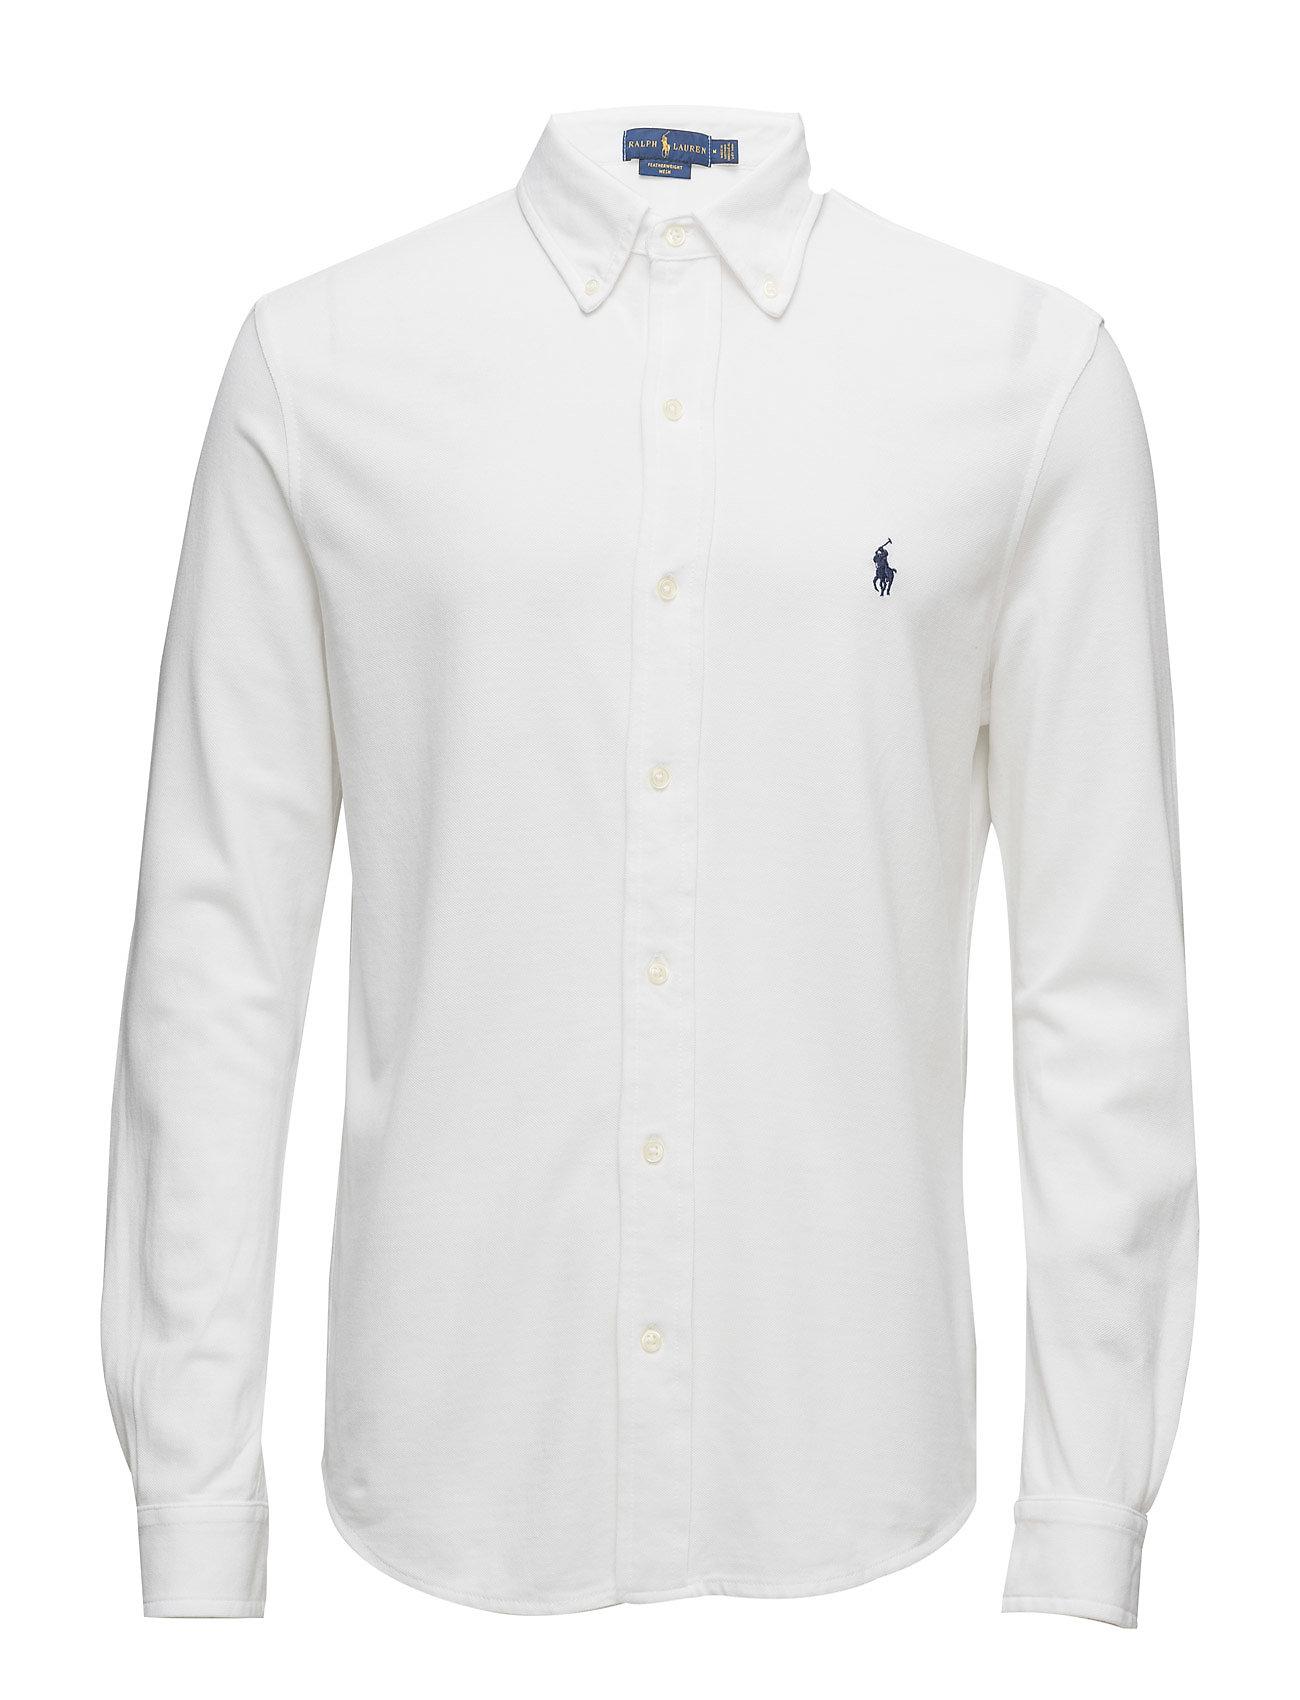 Polo Ralph Lauren Custom Fit Featherweight Mesh Shirt - WHITE